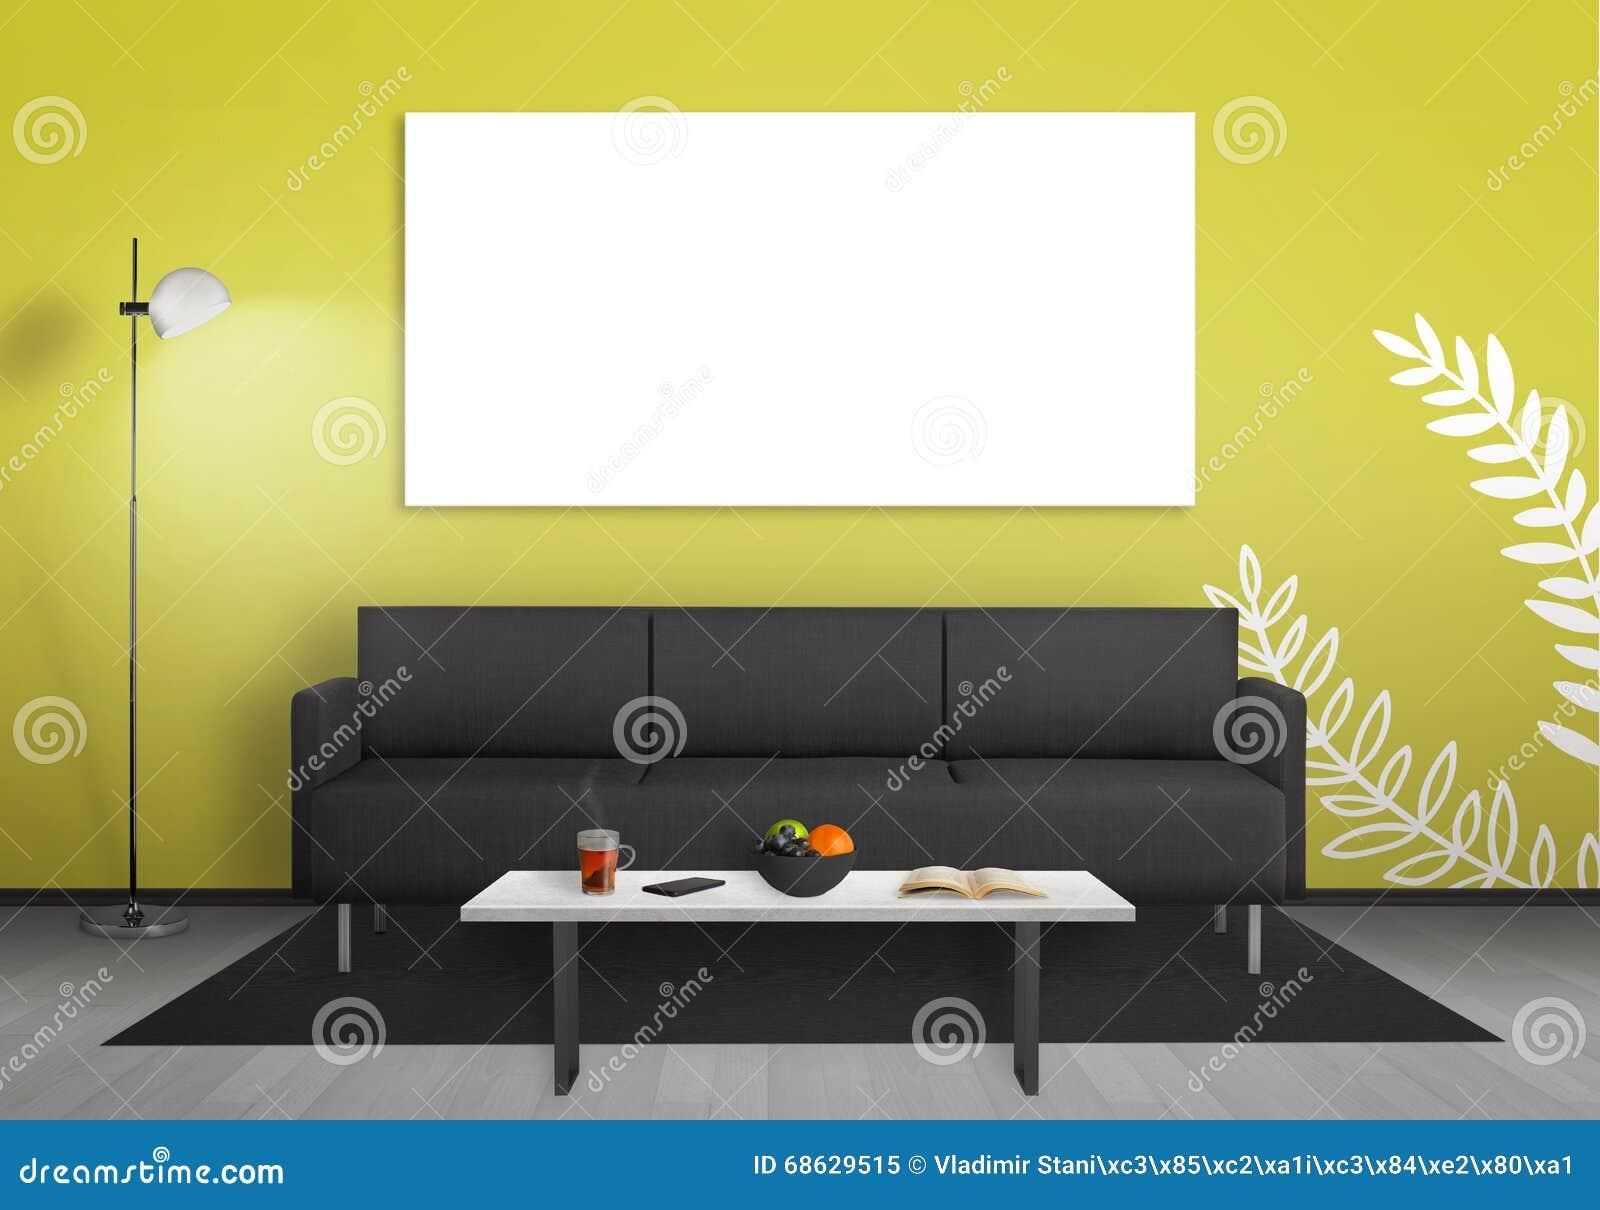 Pareti In Tela : Tessuto per pareti mobili et controsoffitti a tinta unita in